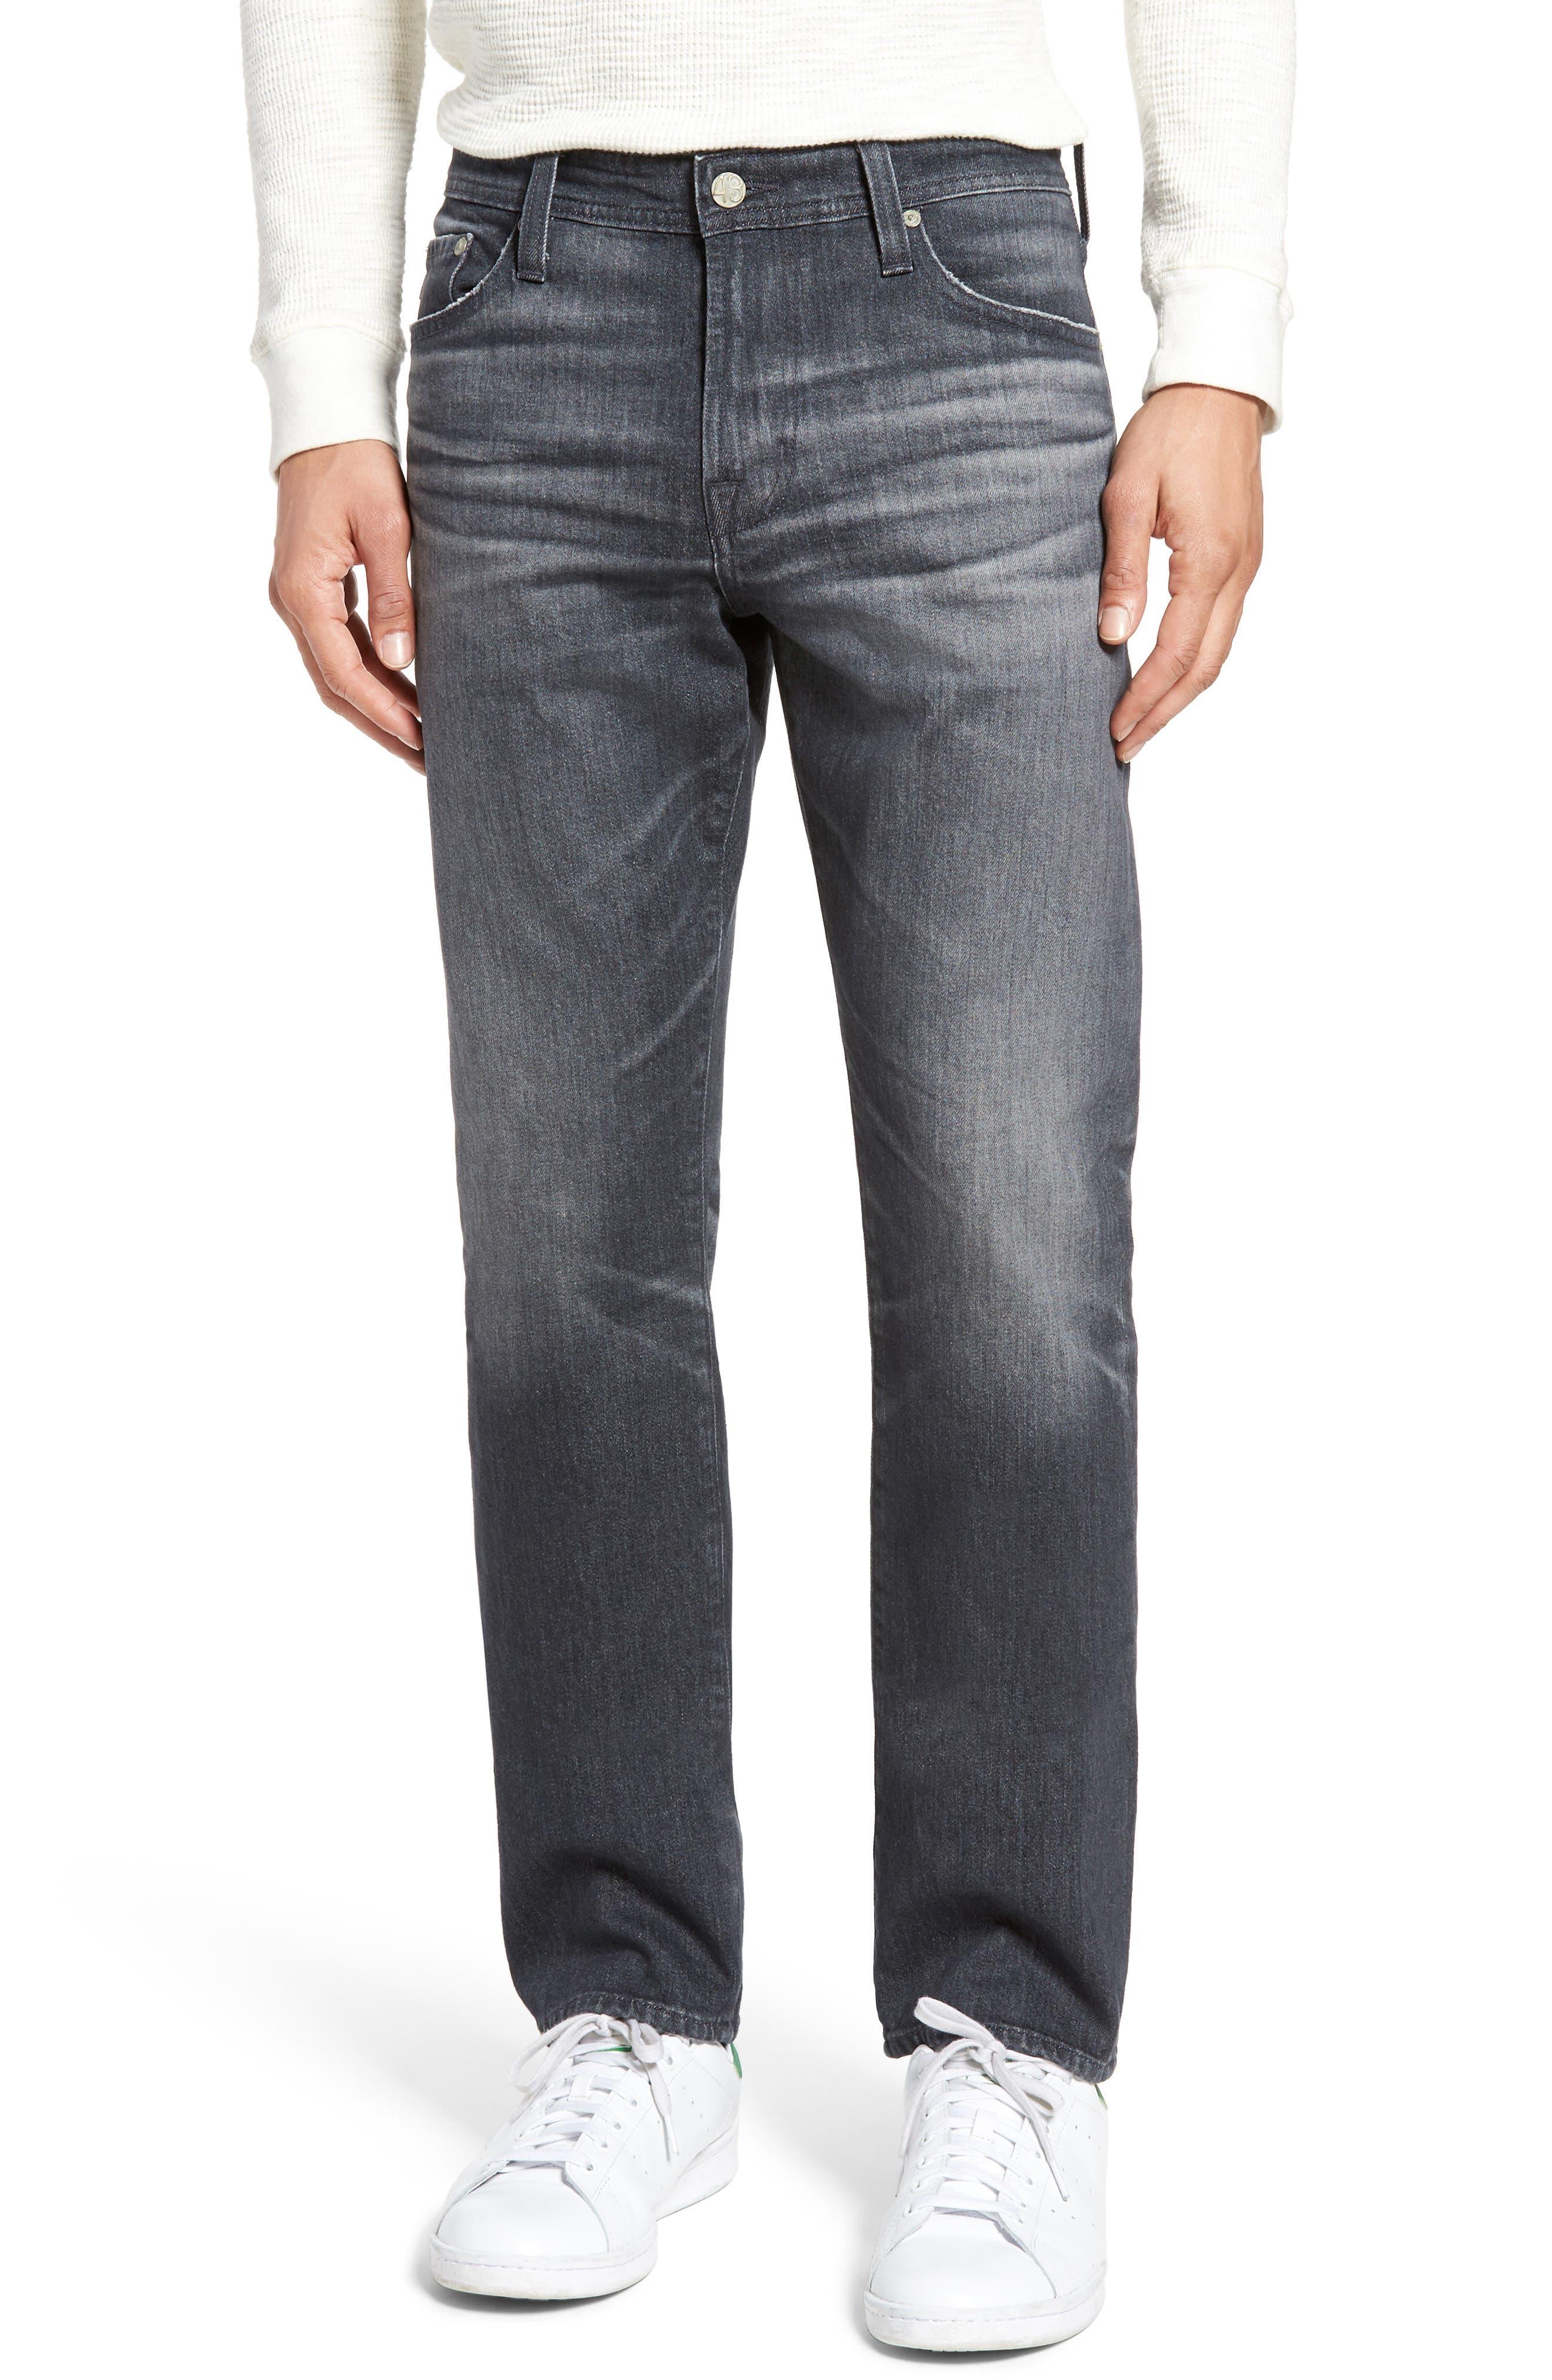 Everett Slim Straight Leg Jeans,                             Main thumbnail 1, color,                             023